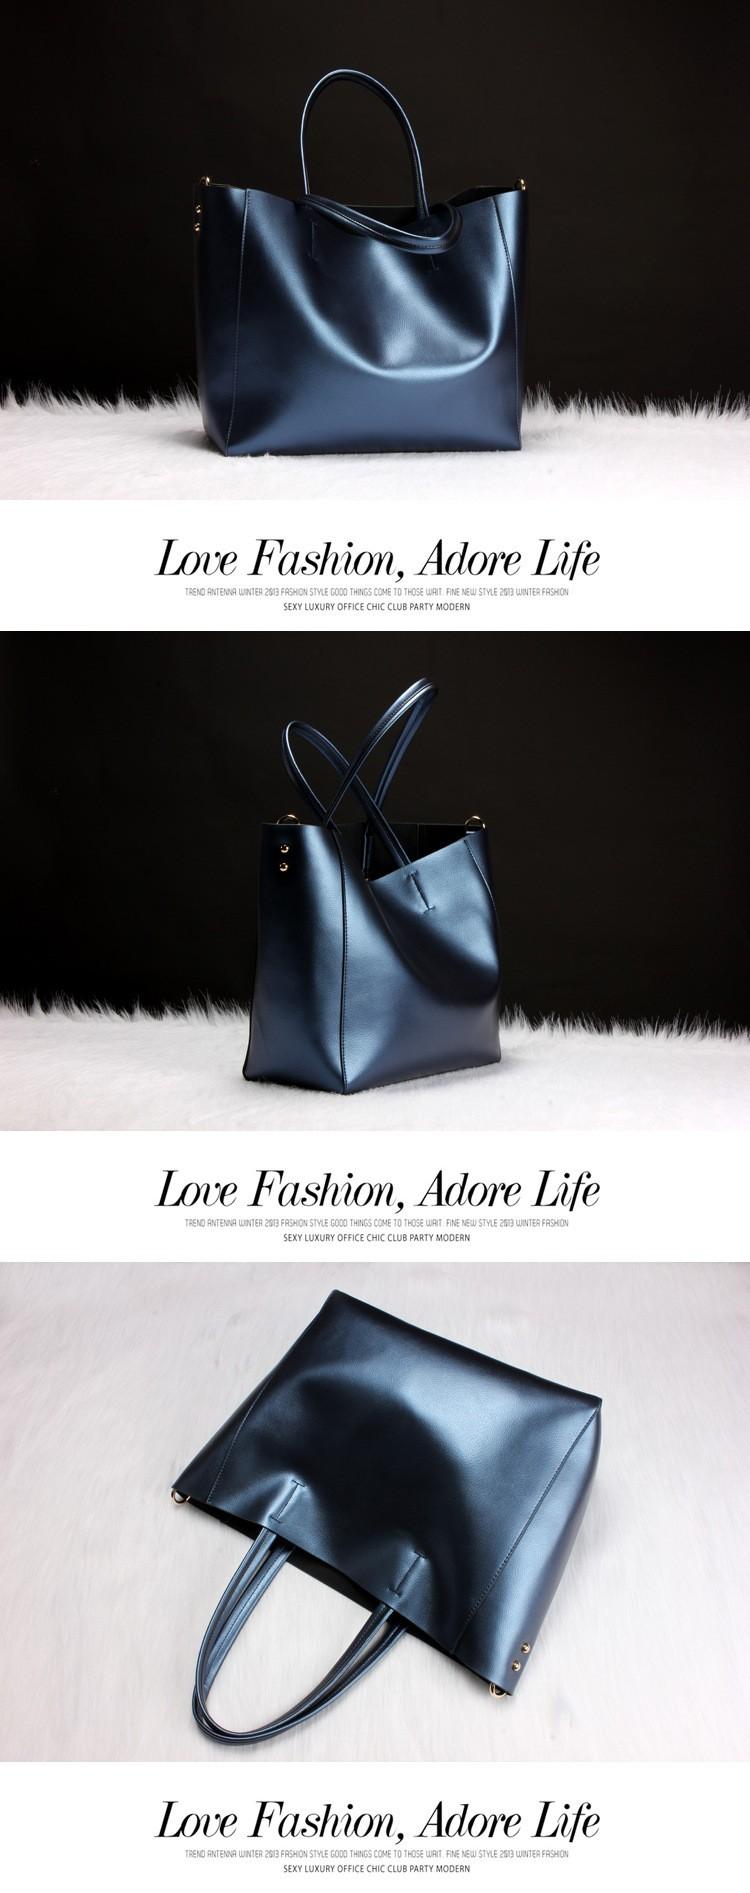 Woman bags 2016 luxury genuine leather handbag shoulder women big bag crossbody shopping bags